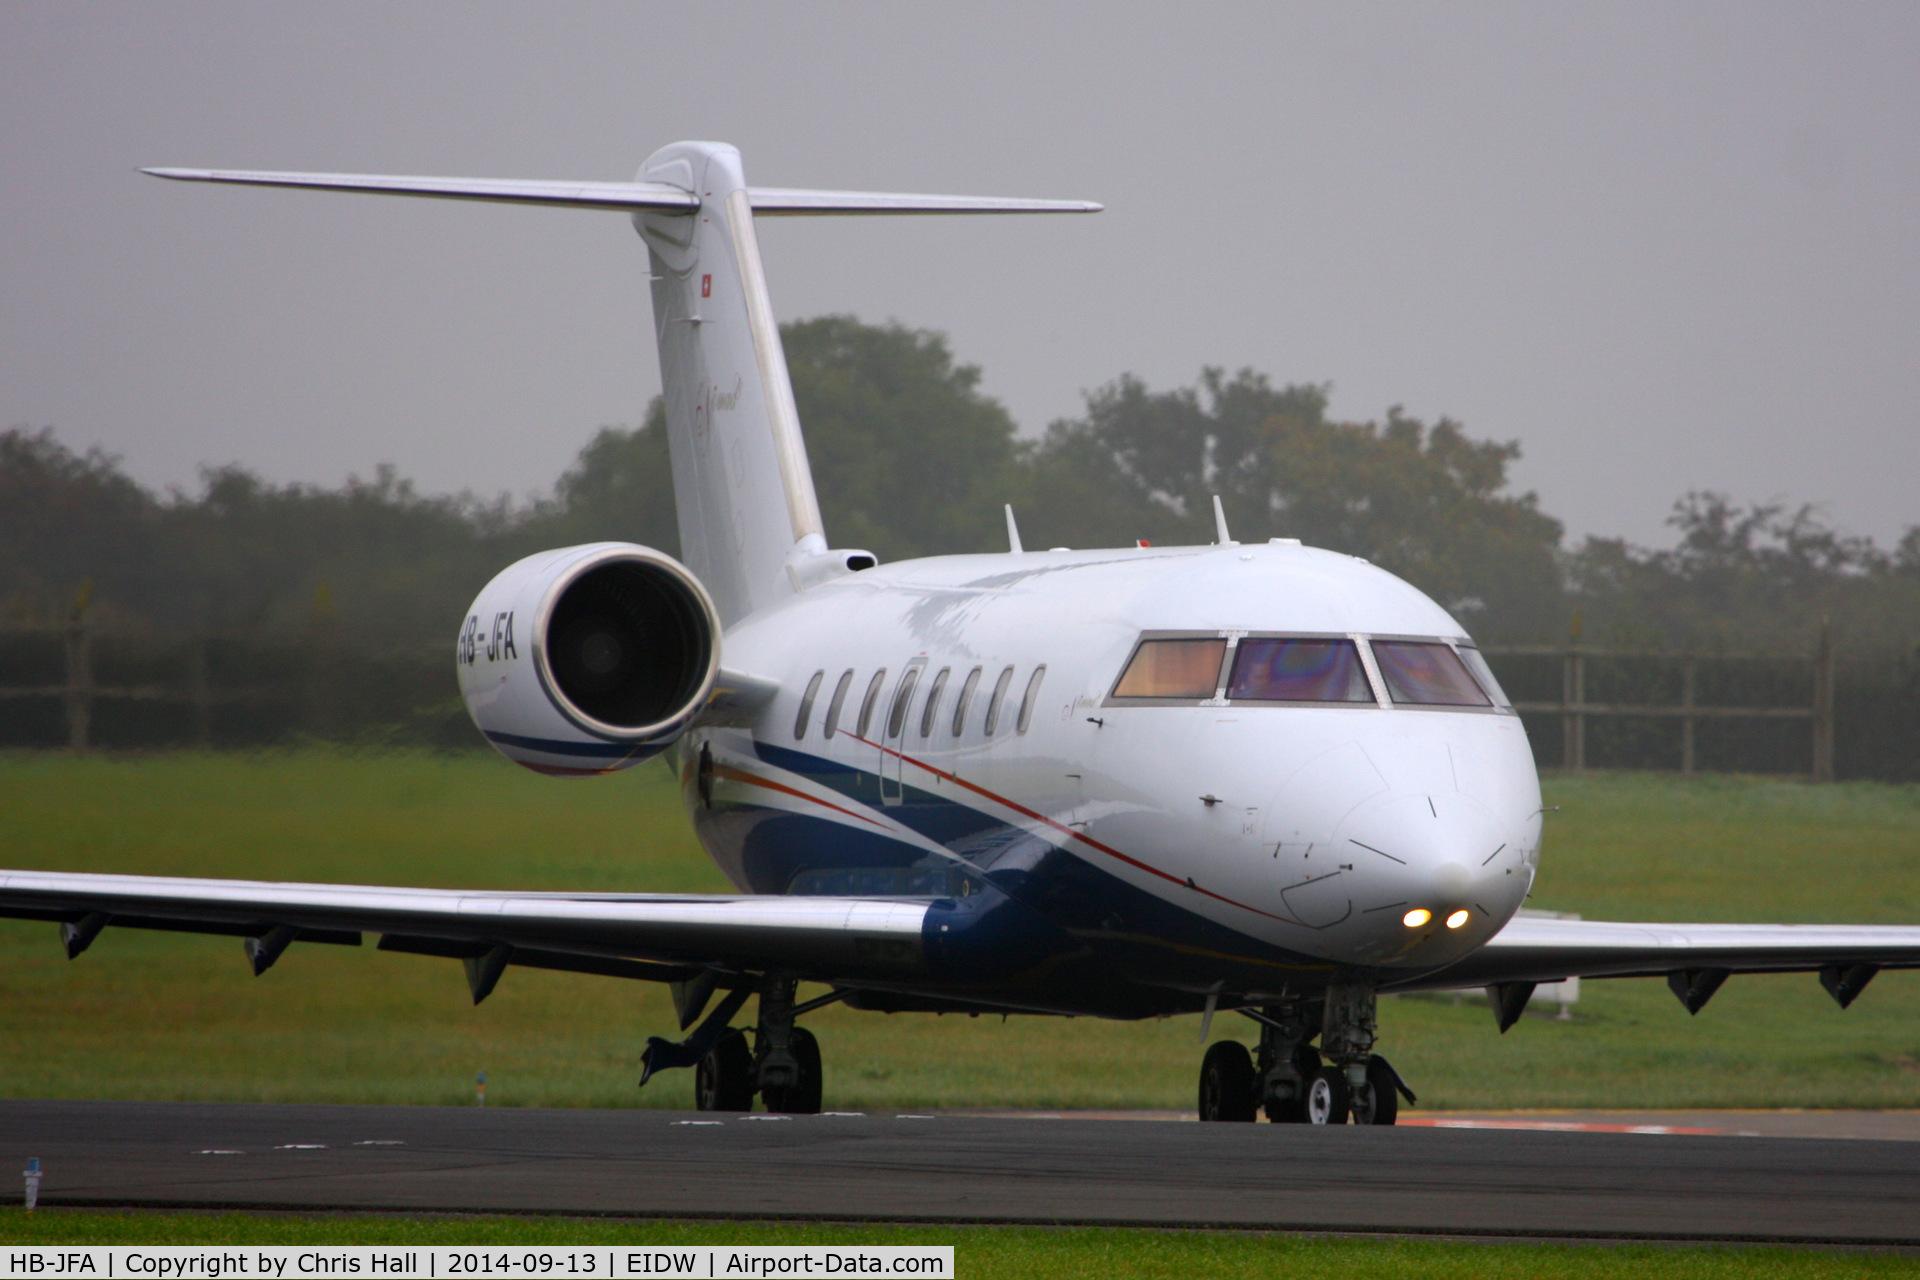 HB-JFA, 2007 Bombardier Challenger 605 (CL-600-2B16) C/N 5715, Nomad Aviation